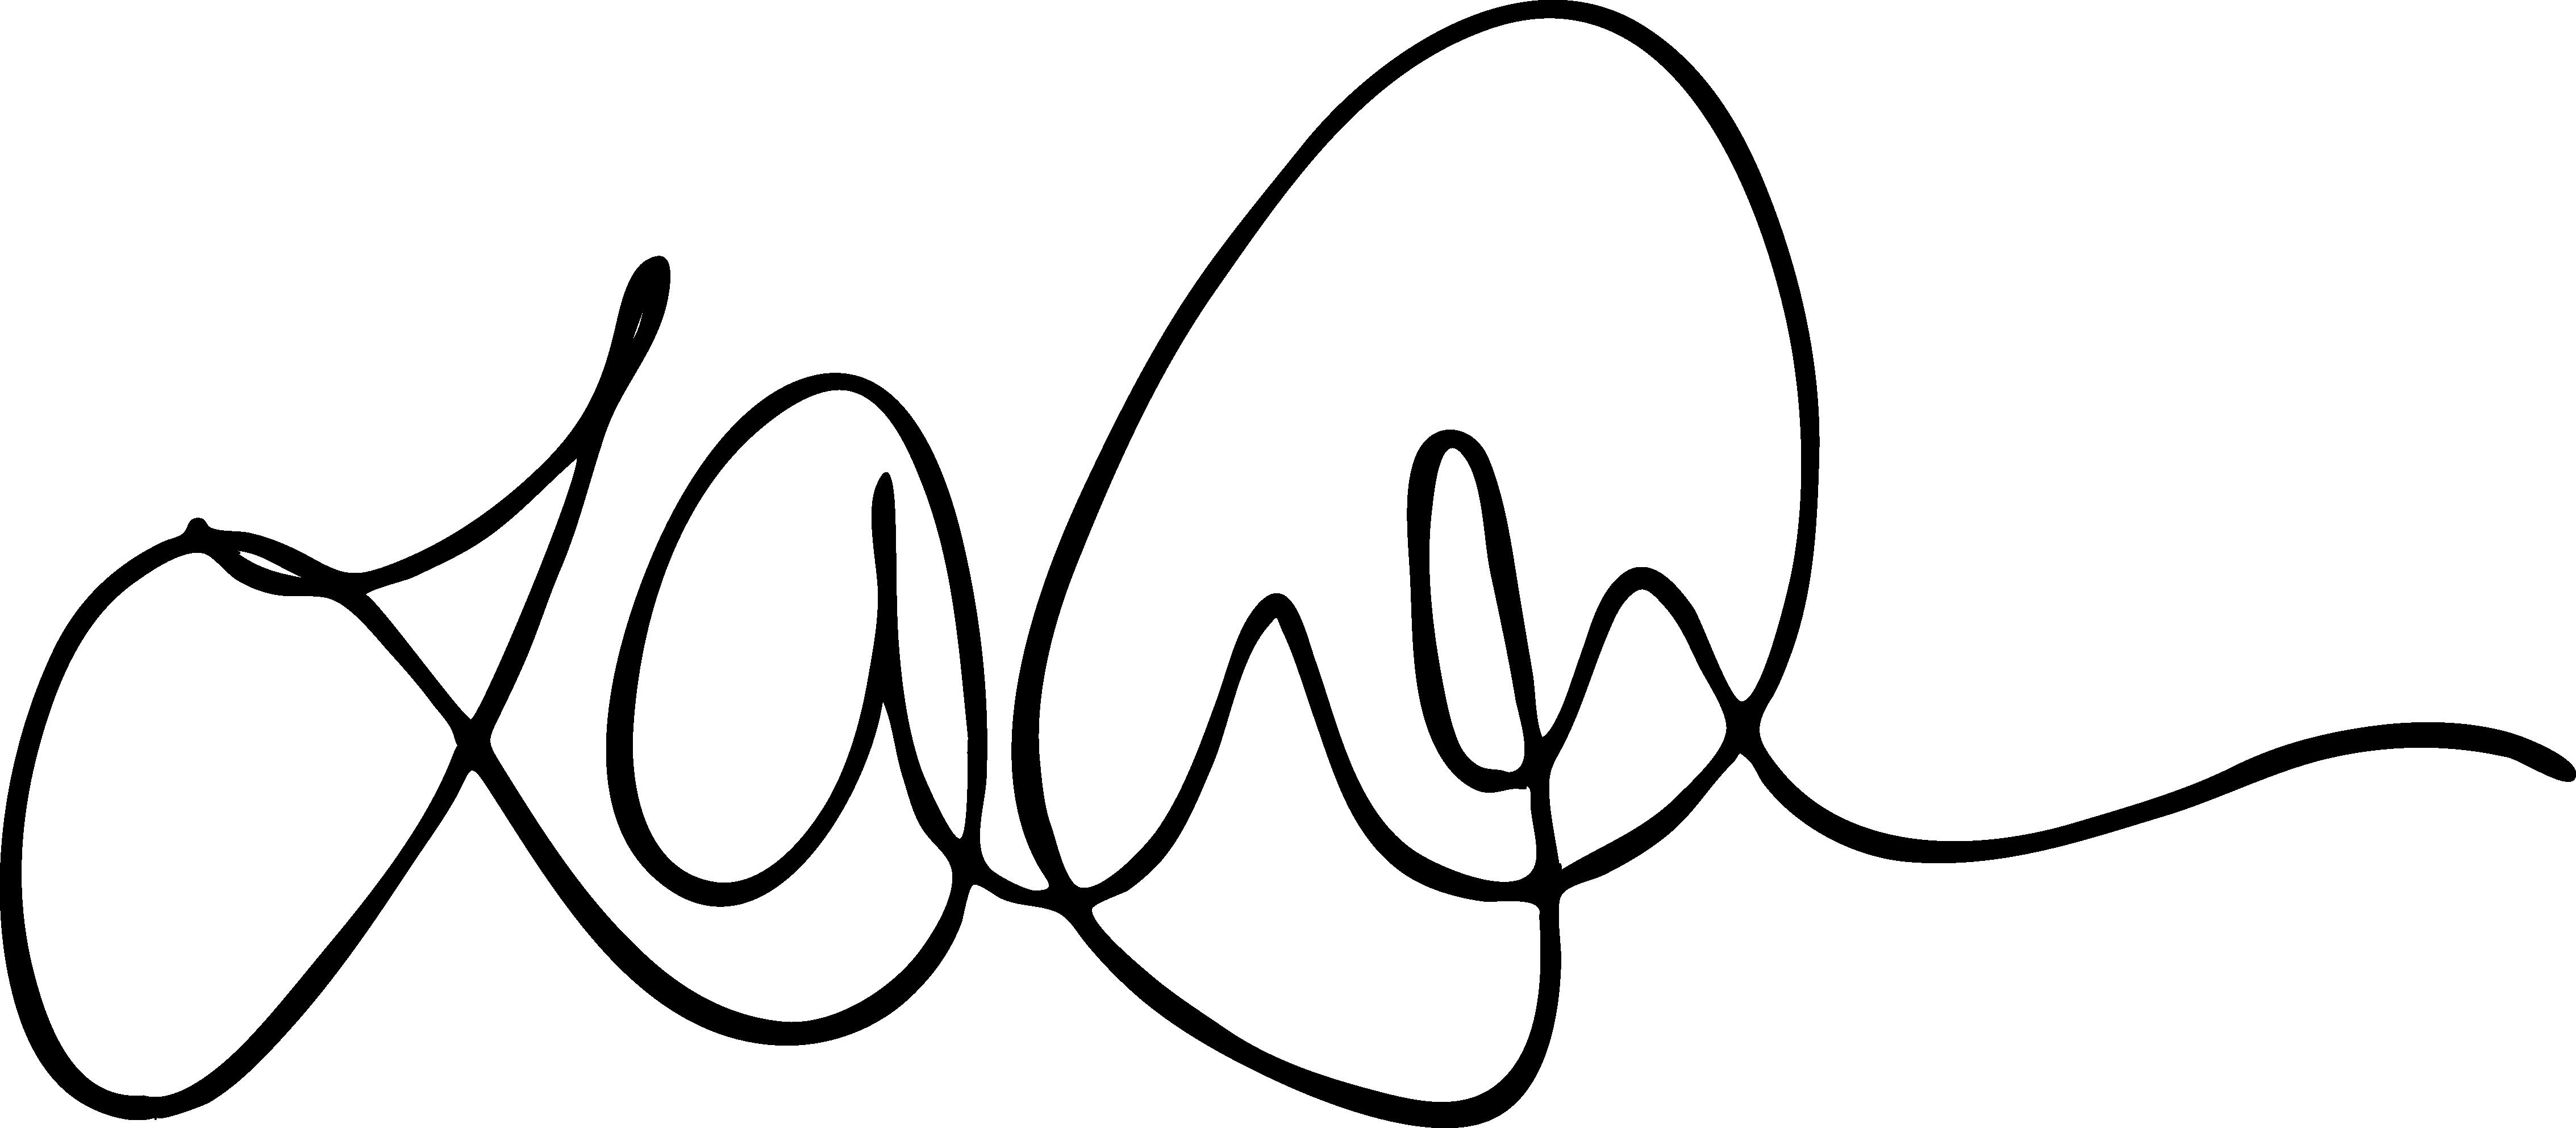 LAUREN GENTILESCO Signature